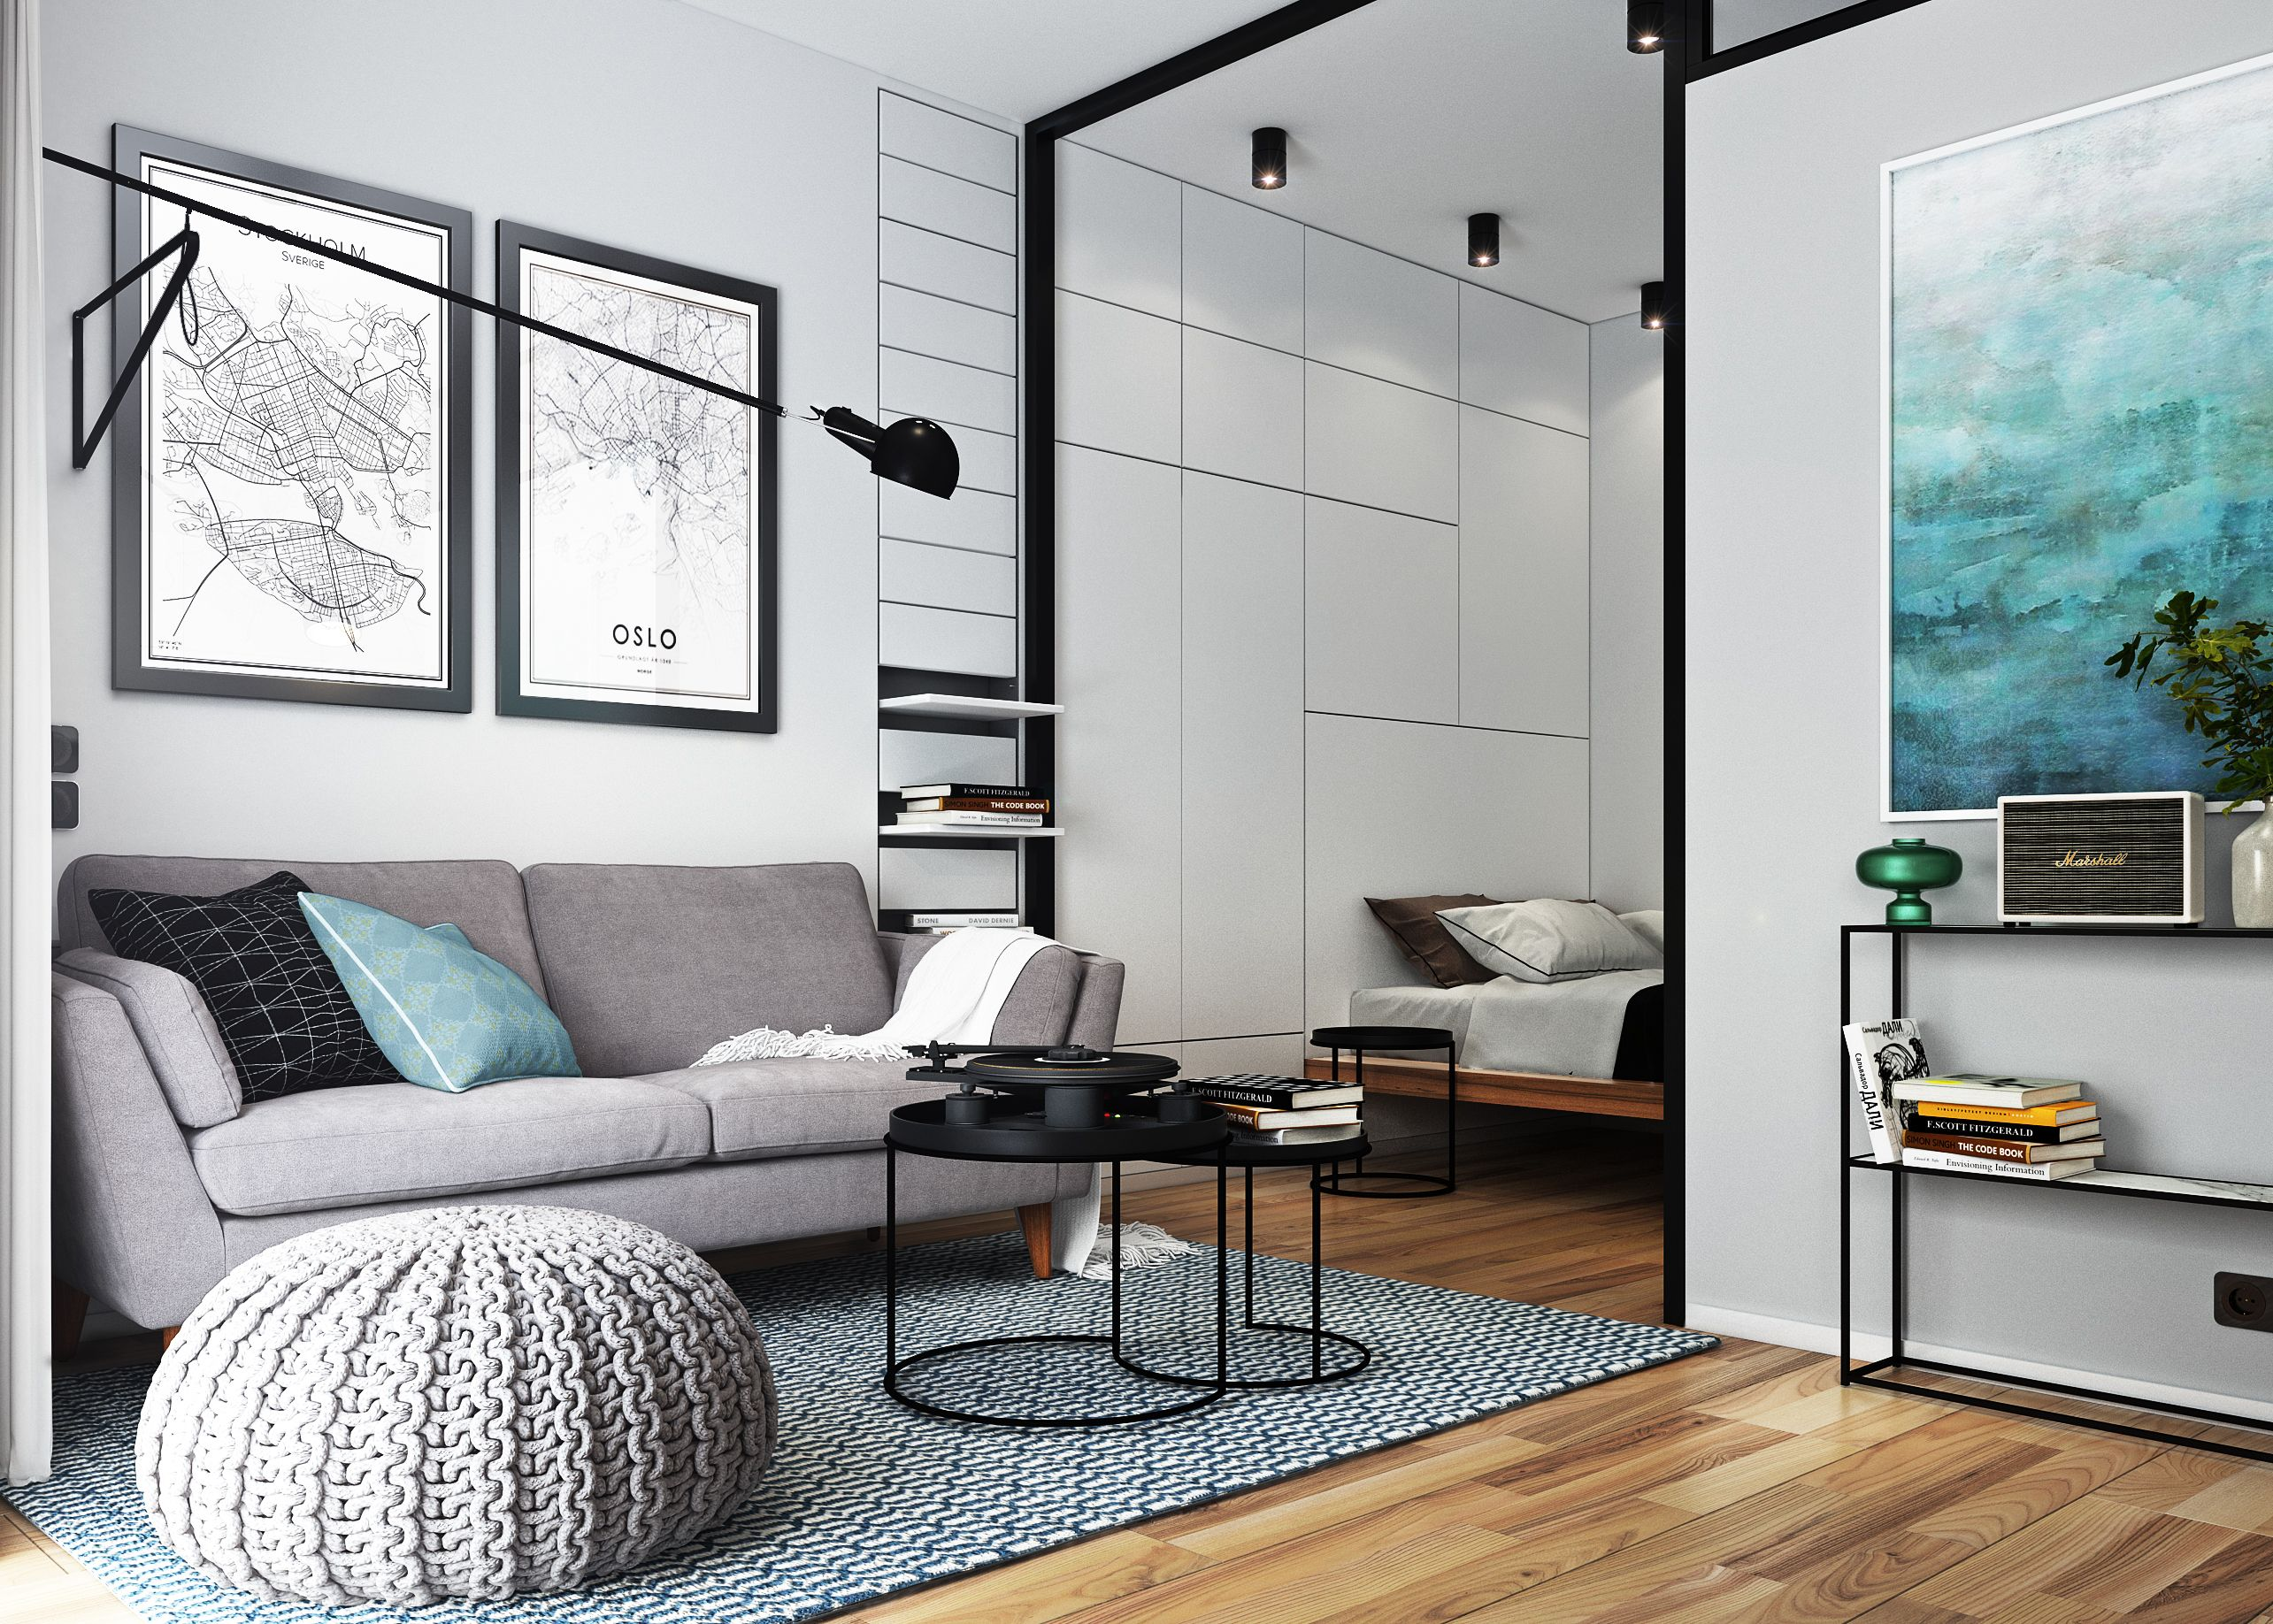 Interiors Apartment For Men Stockholm Sweden 29 Sqm On Behance